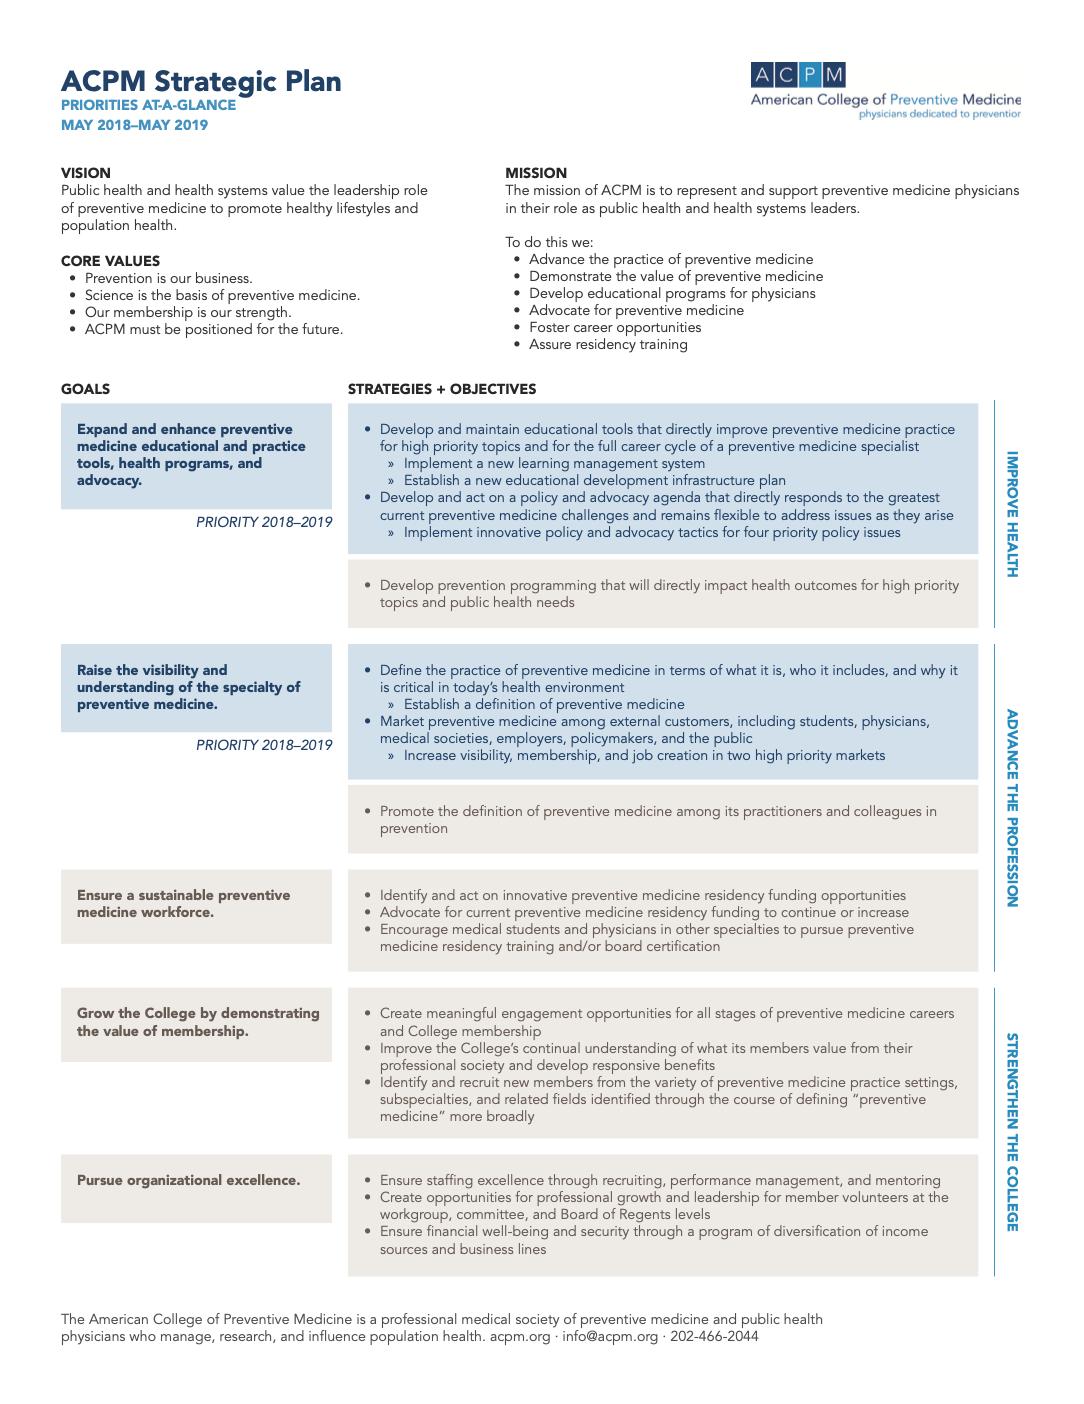 Strategic Plan overview grid